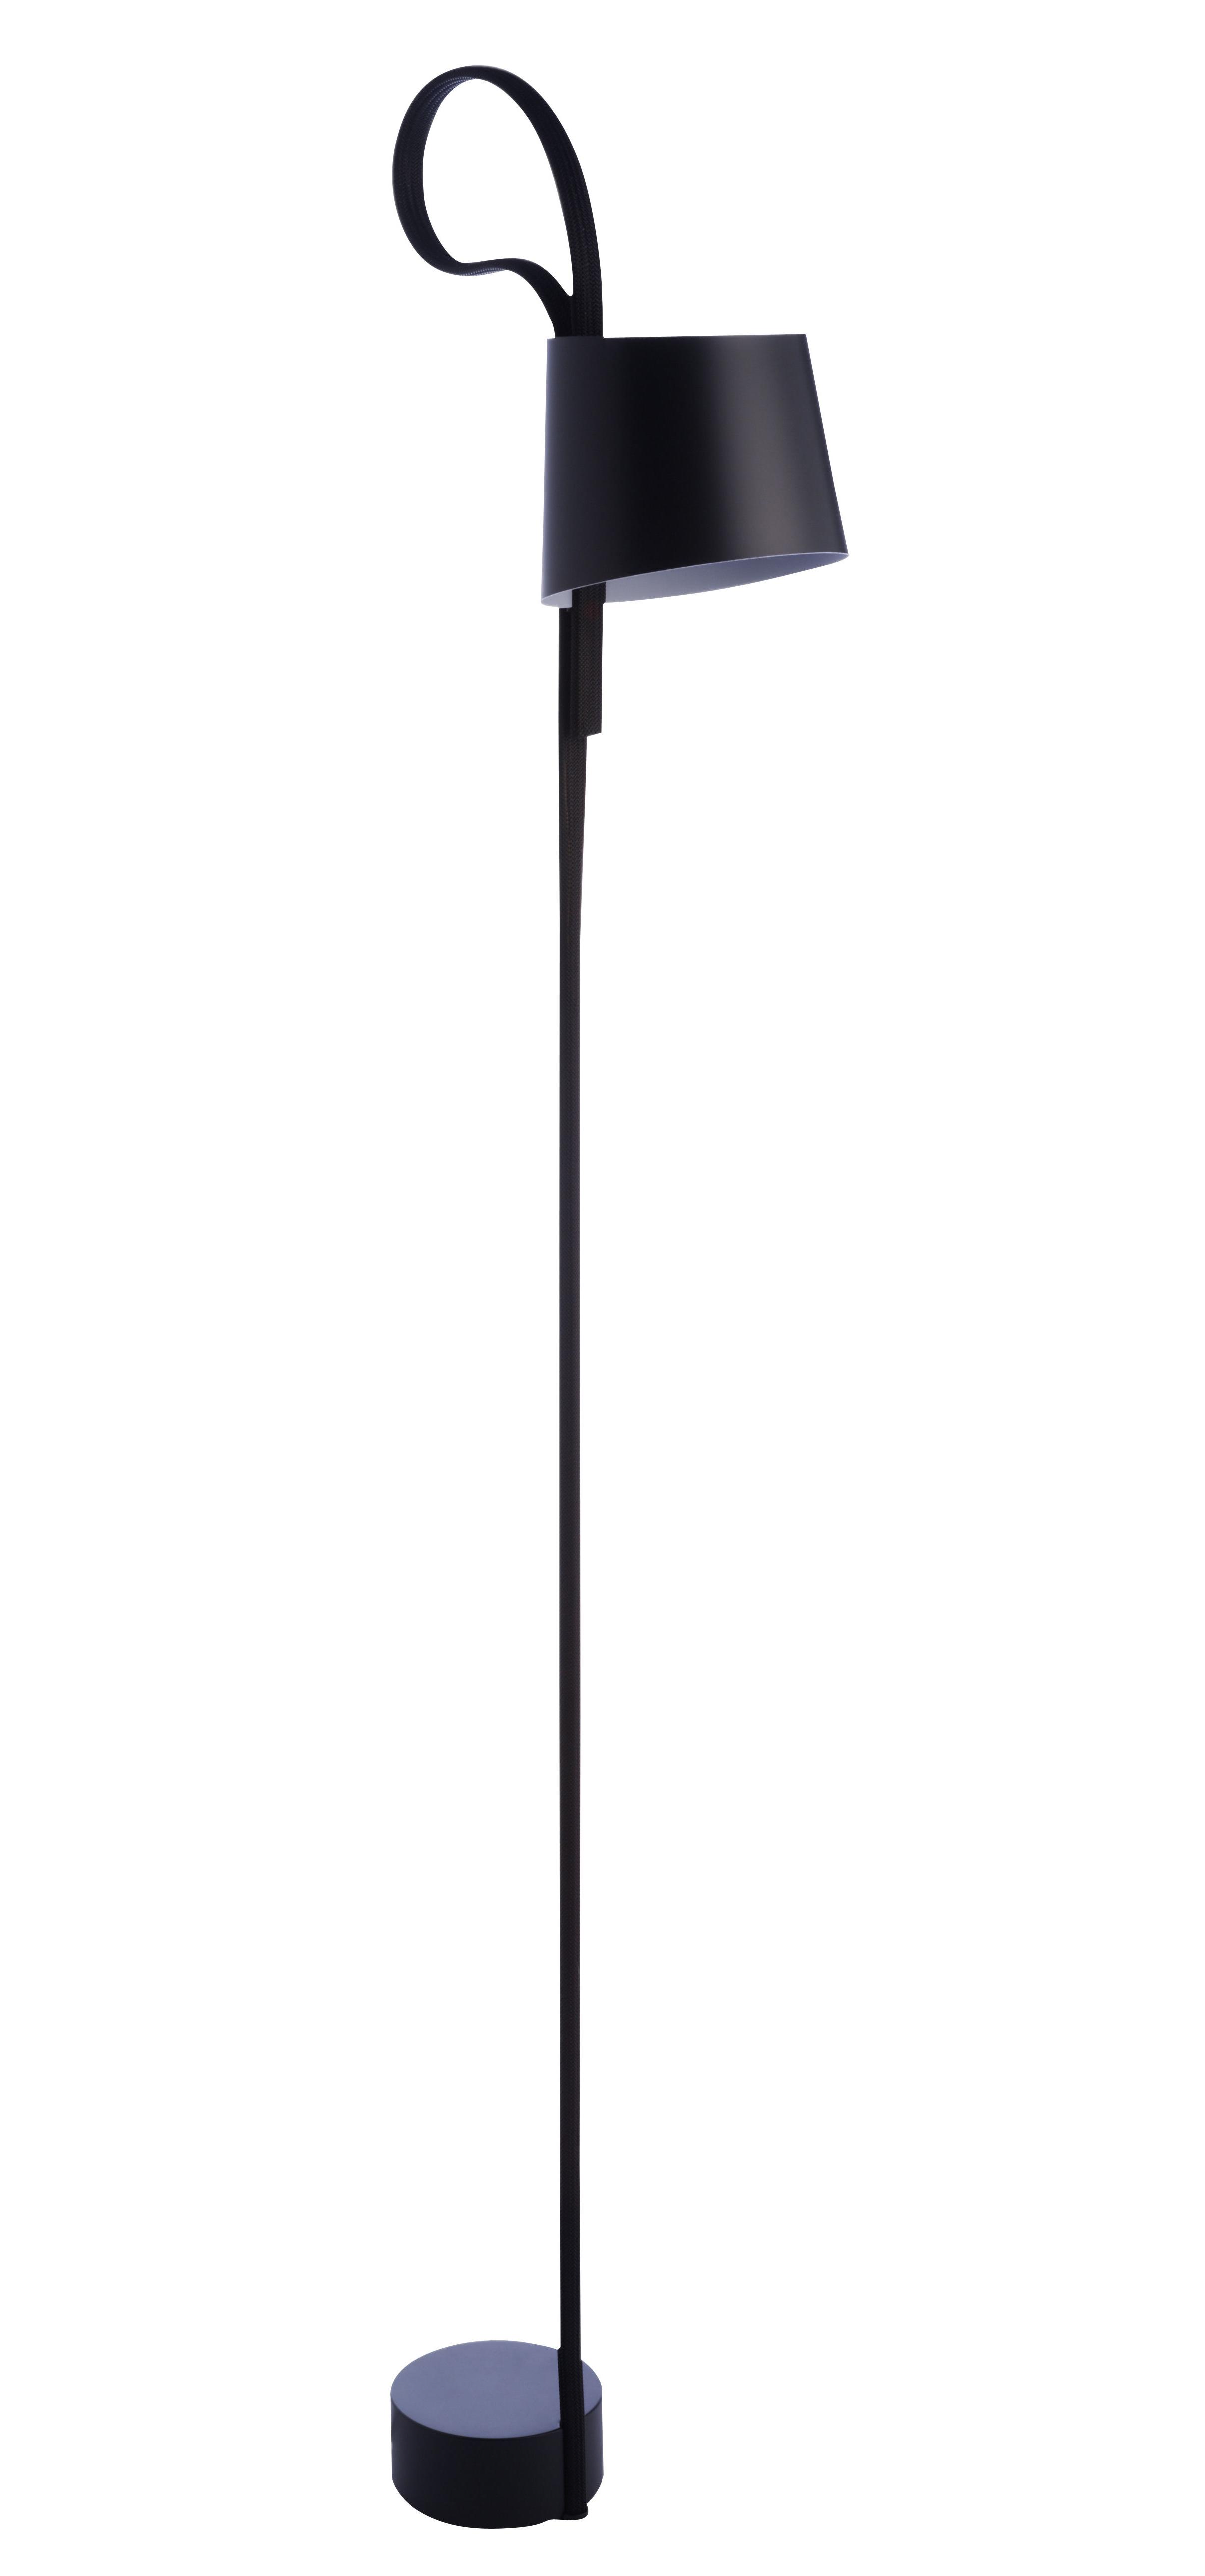 Lighting - Floor lamps - Rope Trick Floor lamp - LED - Adjustable shade by wrong.london - Black - Acrylic, Aluminium, Woven PET